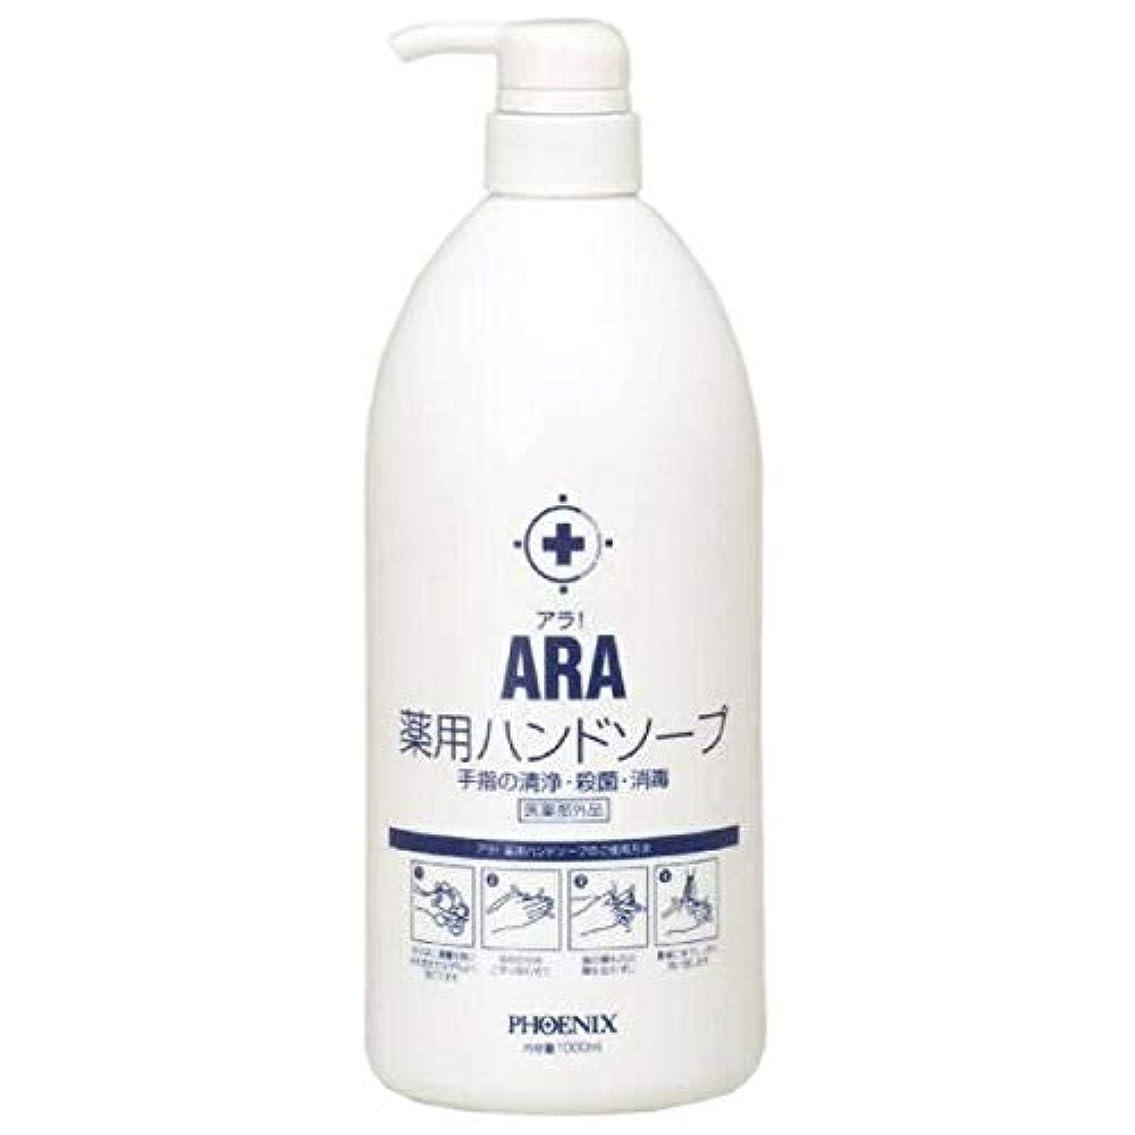 ARA 薬用ハンドソープ(ボトルタイプ) 1000ml×10本入